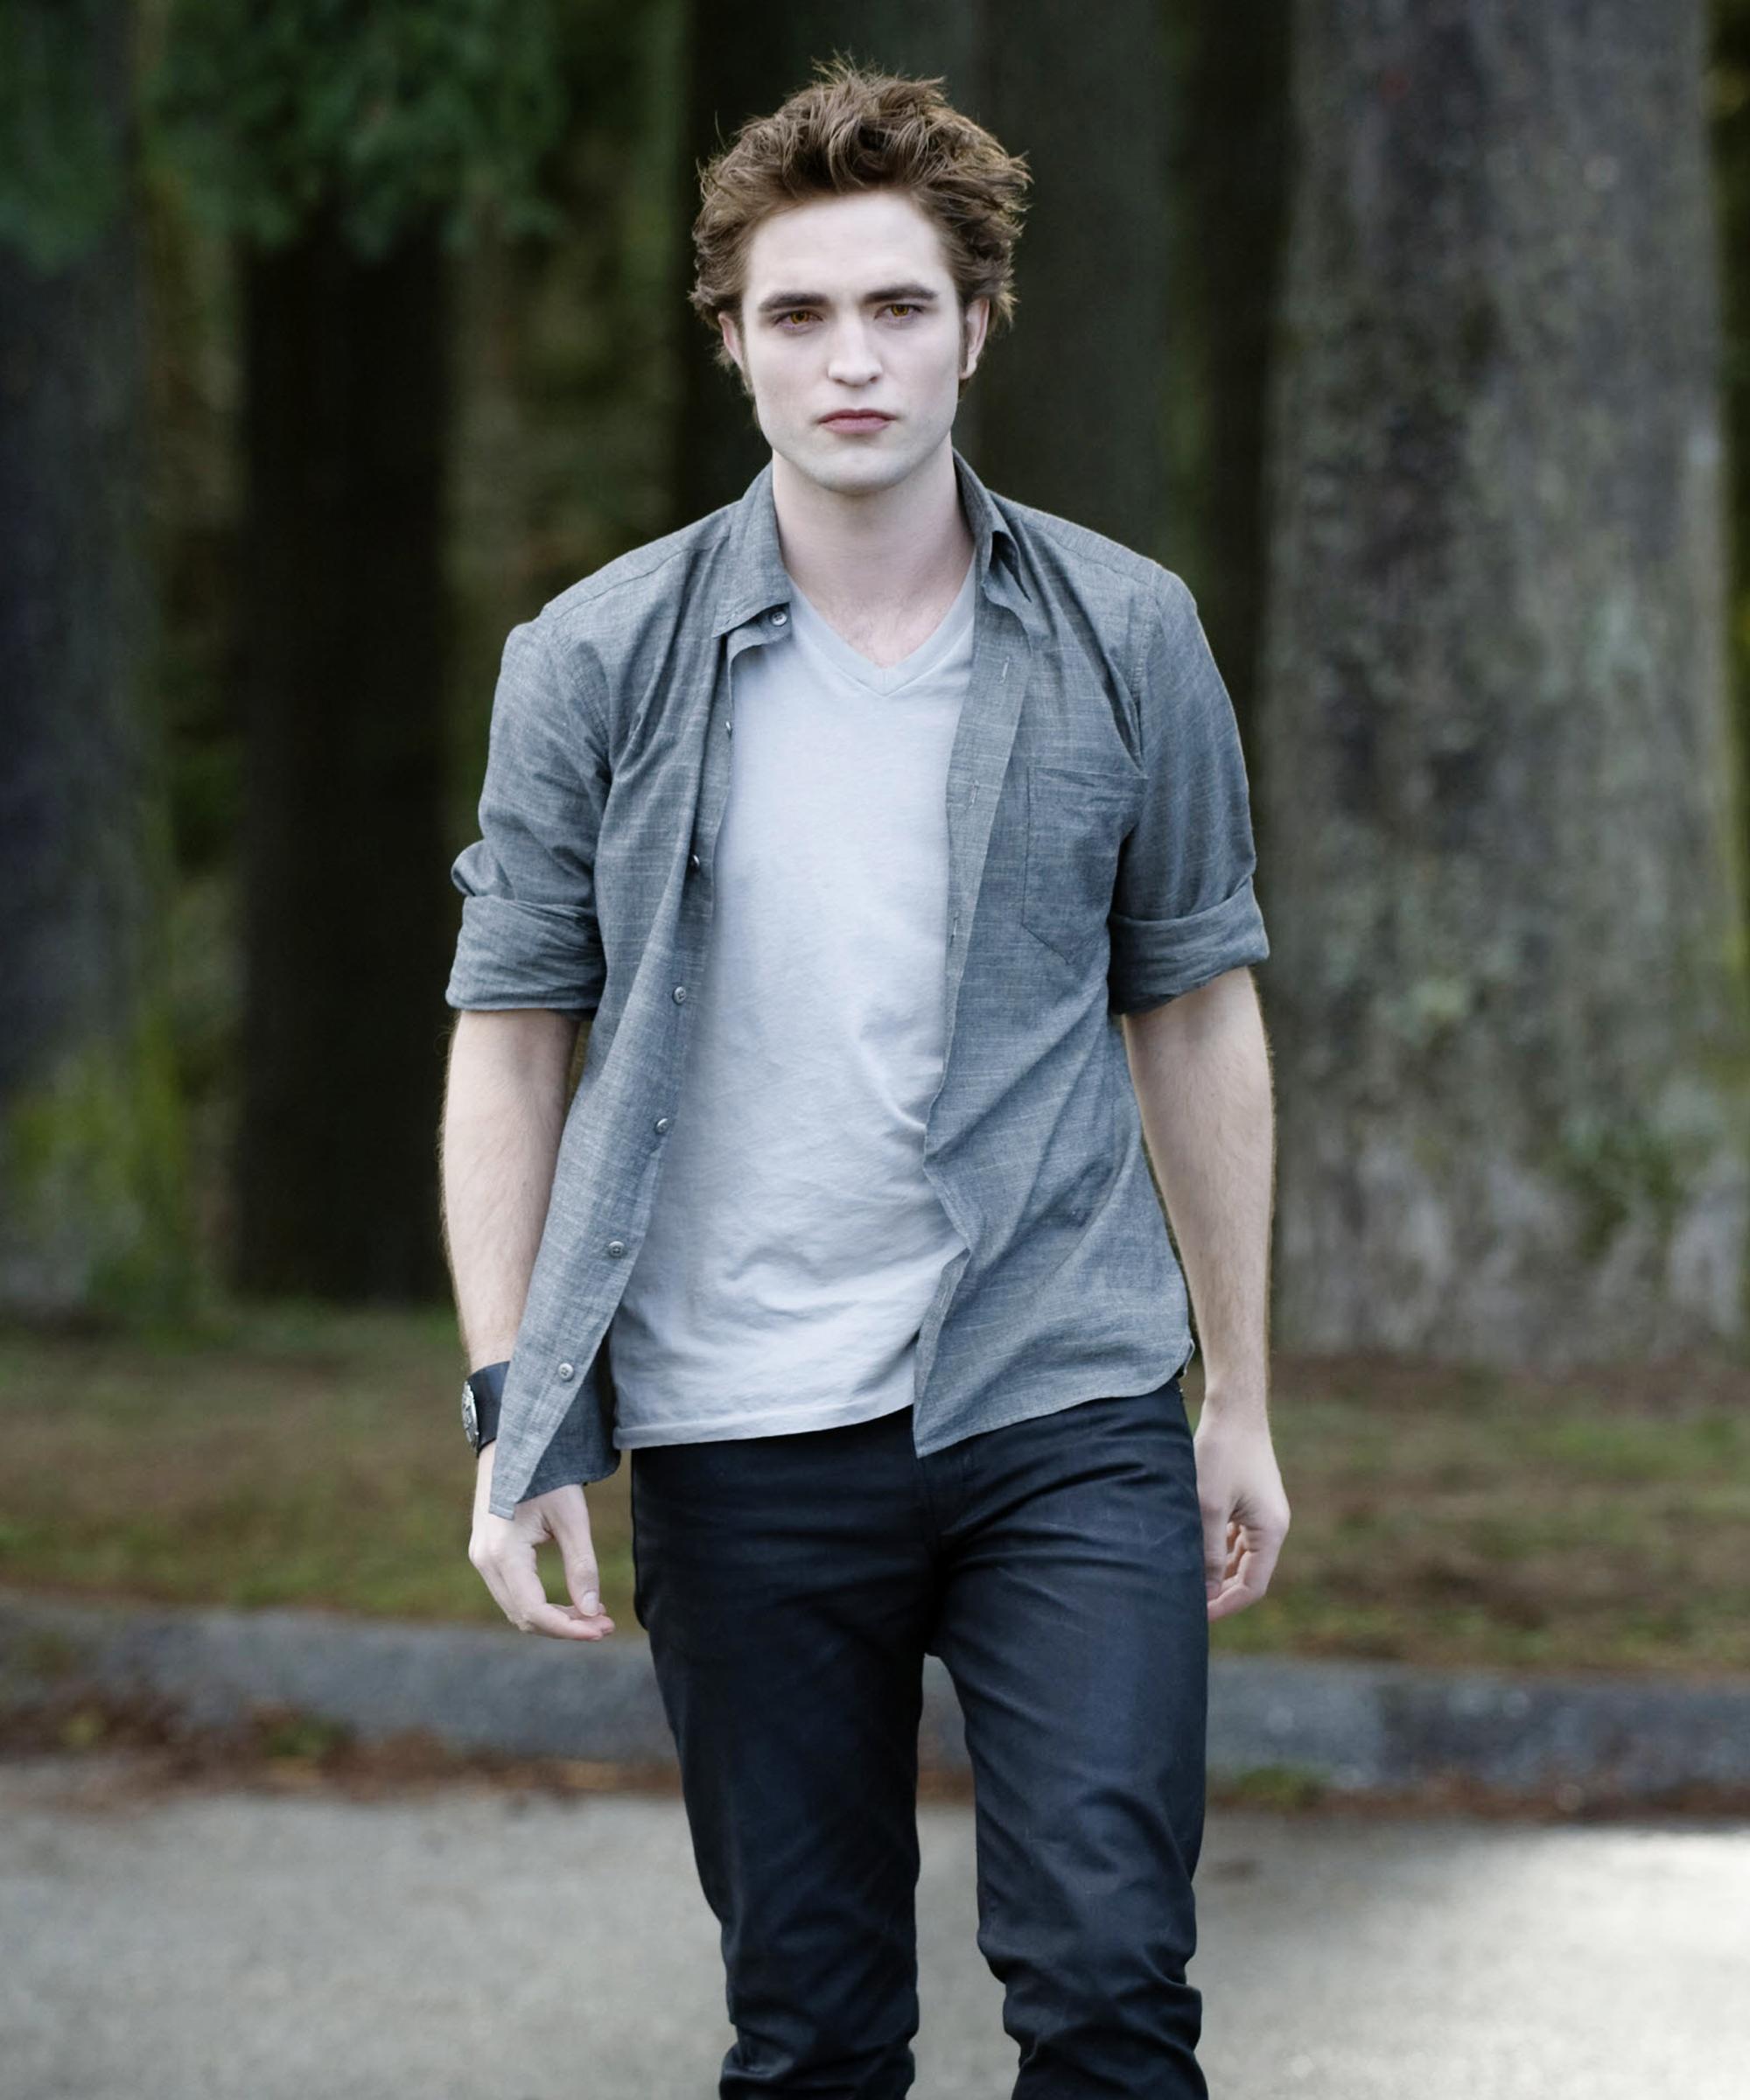 """Twilight"" Creator Is Bringing A New Supernatural Series"